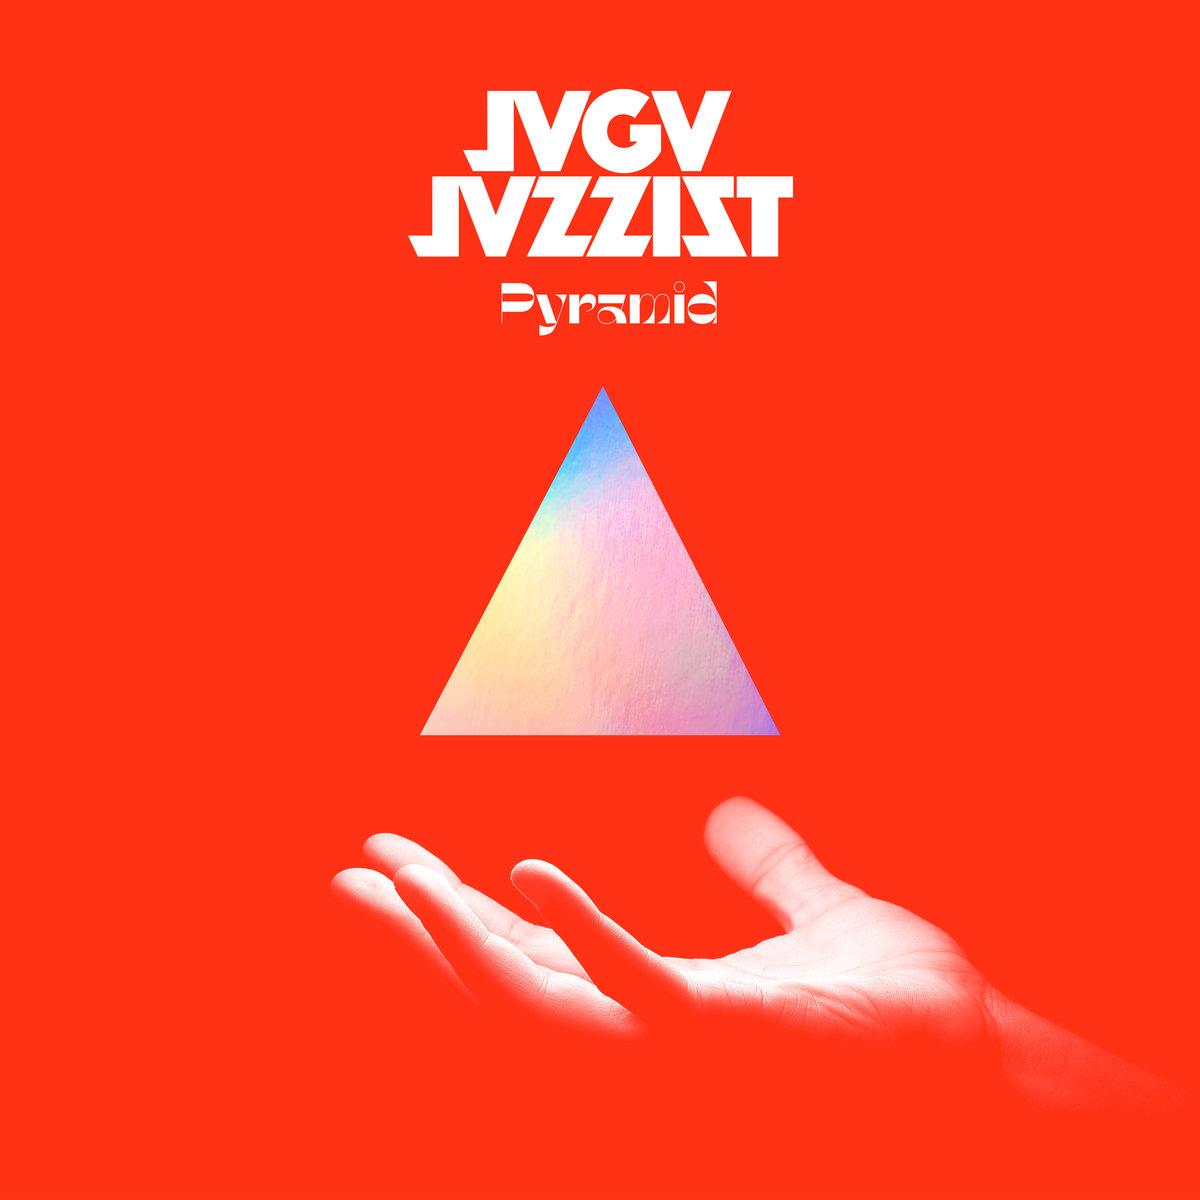 JagaJazzist - Pyramid [2020]